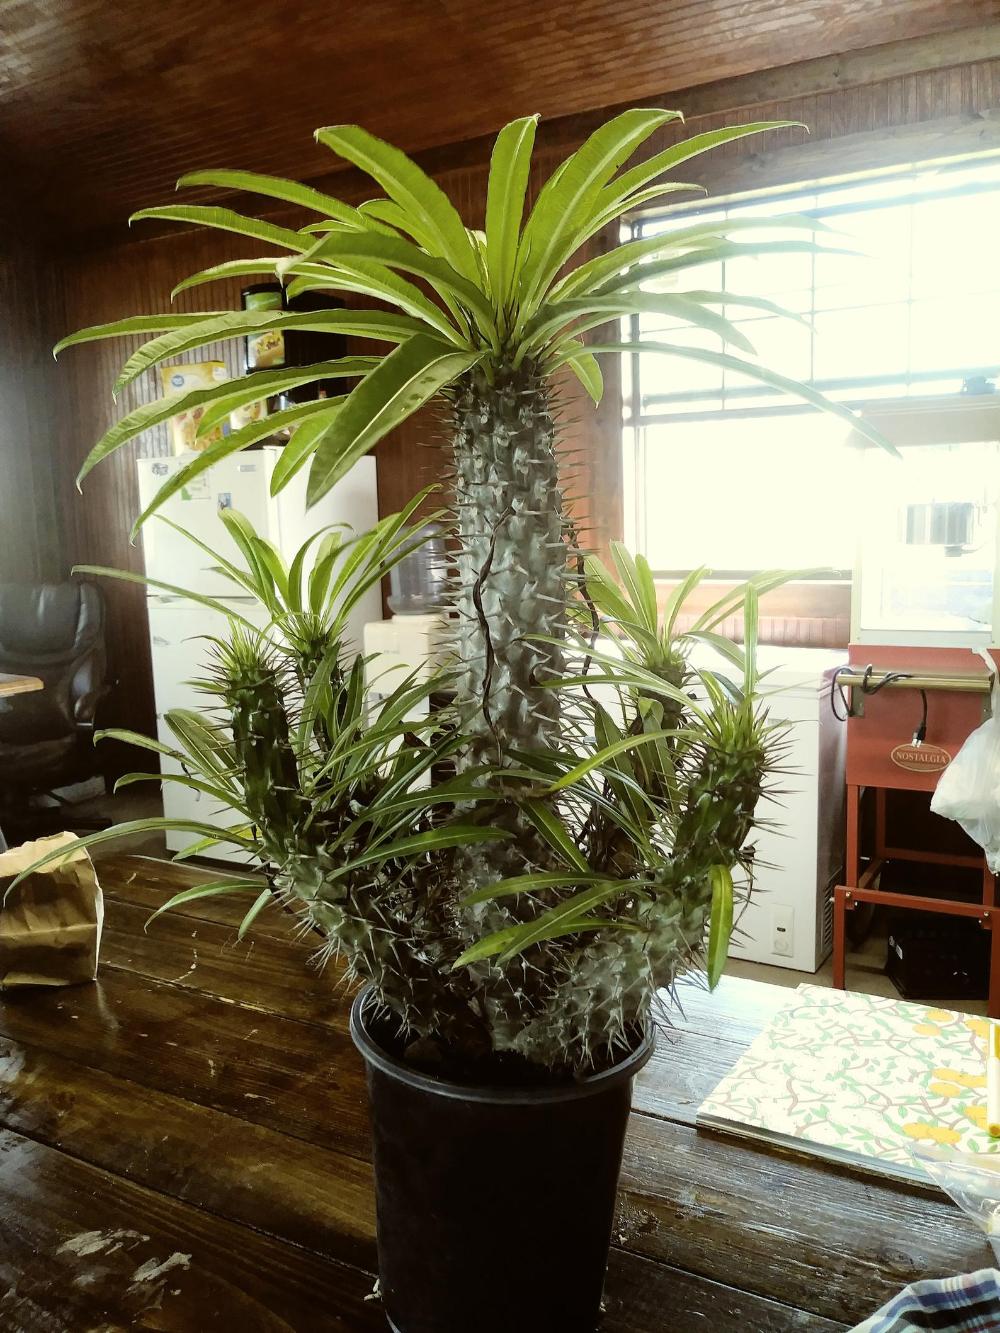 Cactus With Palm Tree Stock Photo 1684409 : Shutterstock   Name Cactus Palm Tree